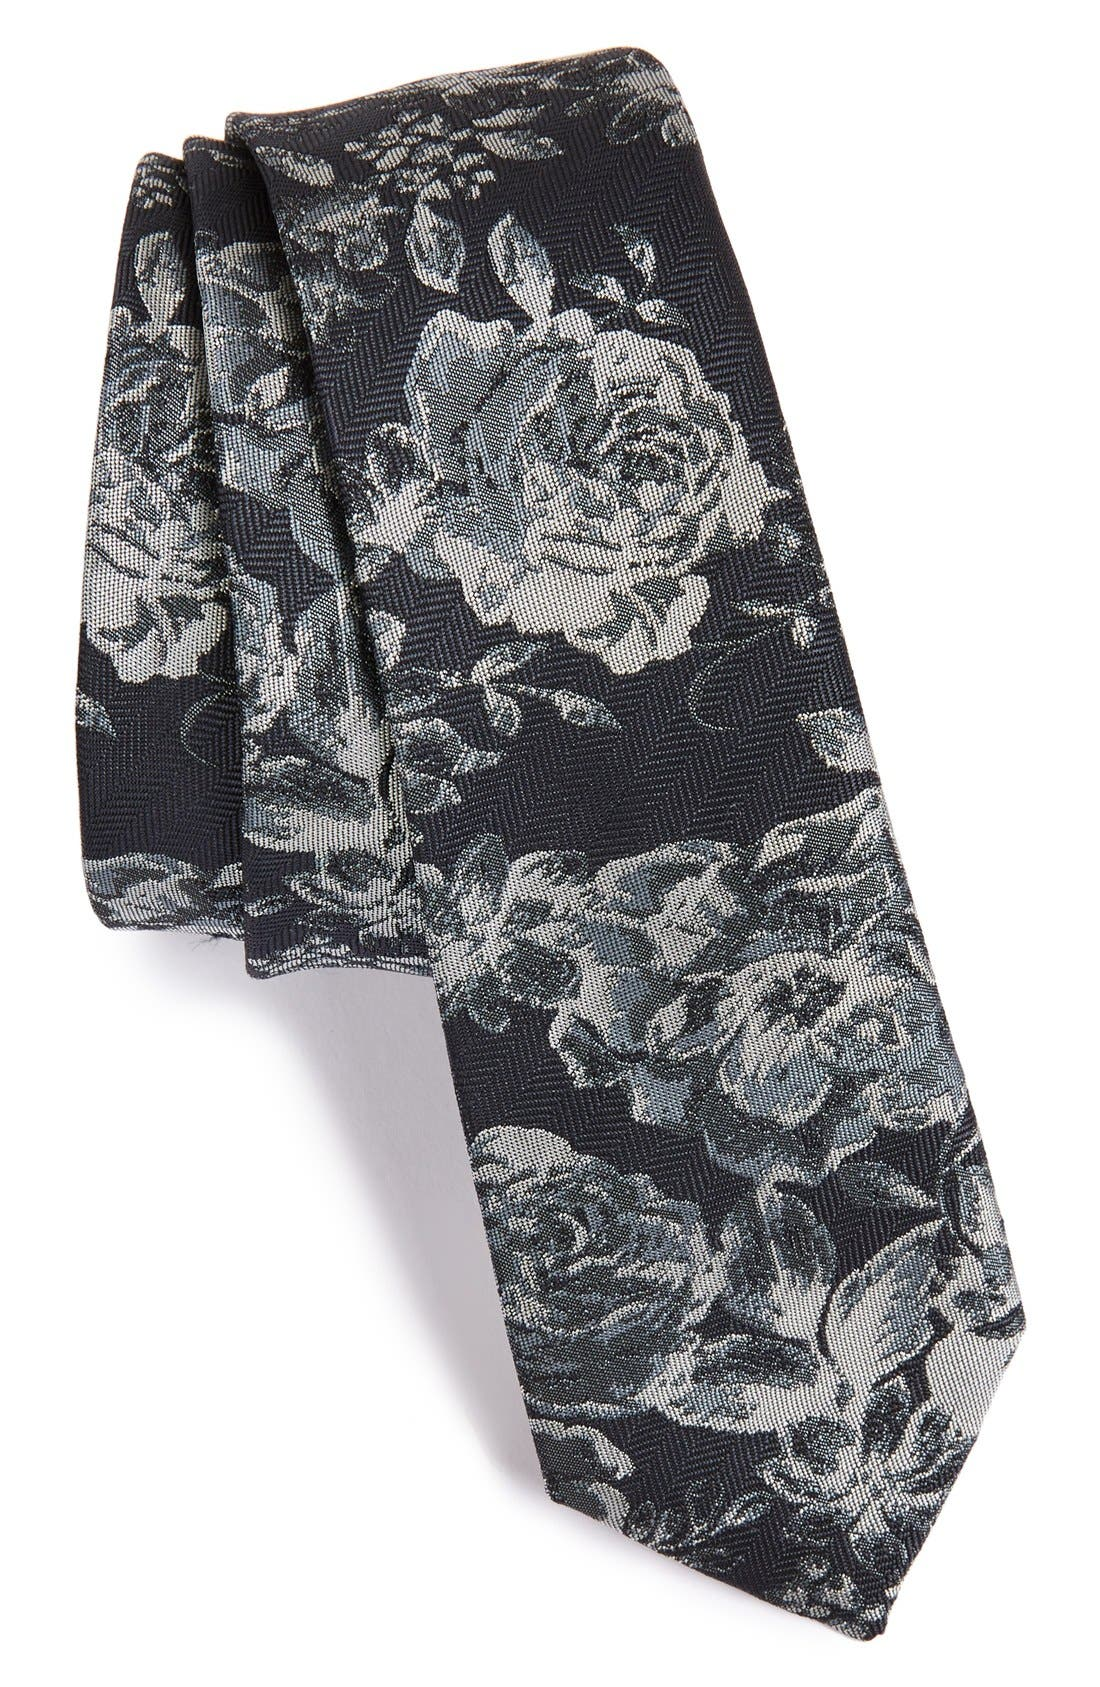 Main Image - Topman Slim Floral Woven Tie